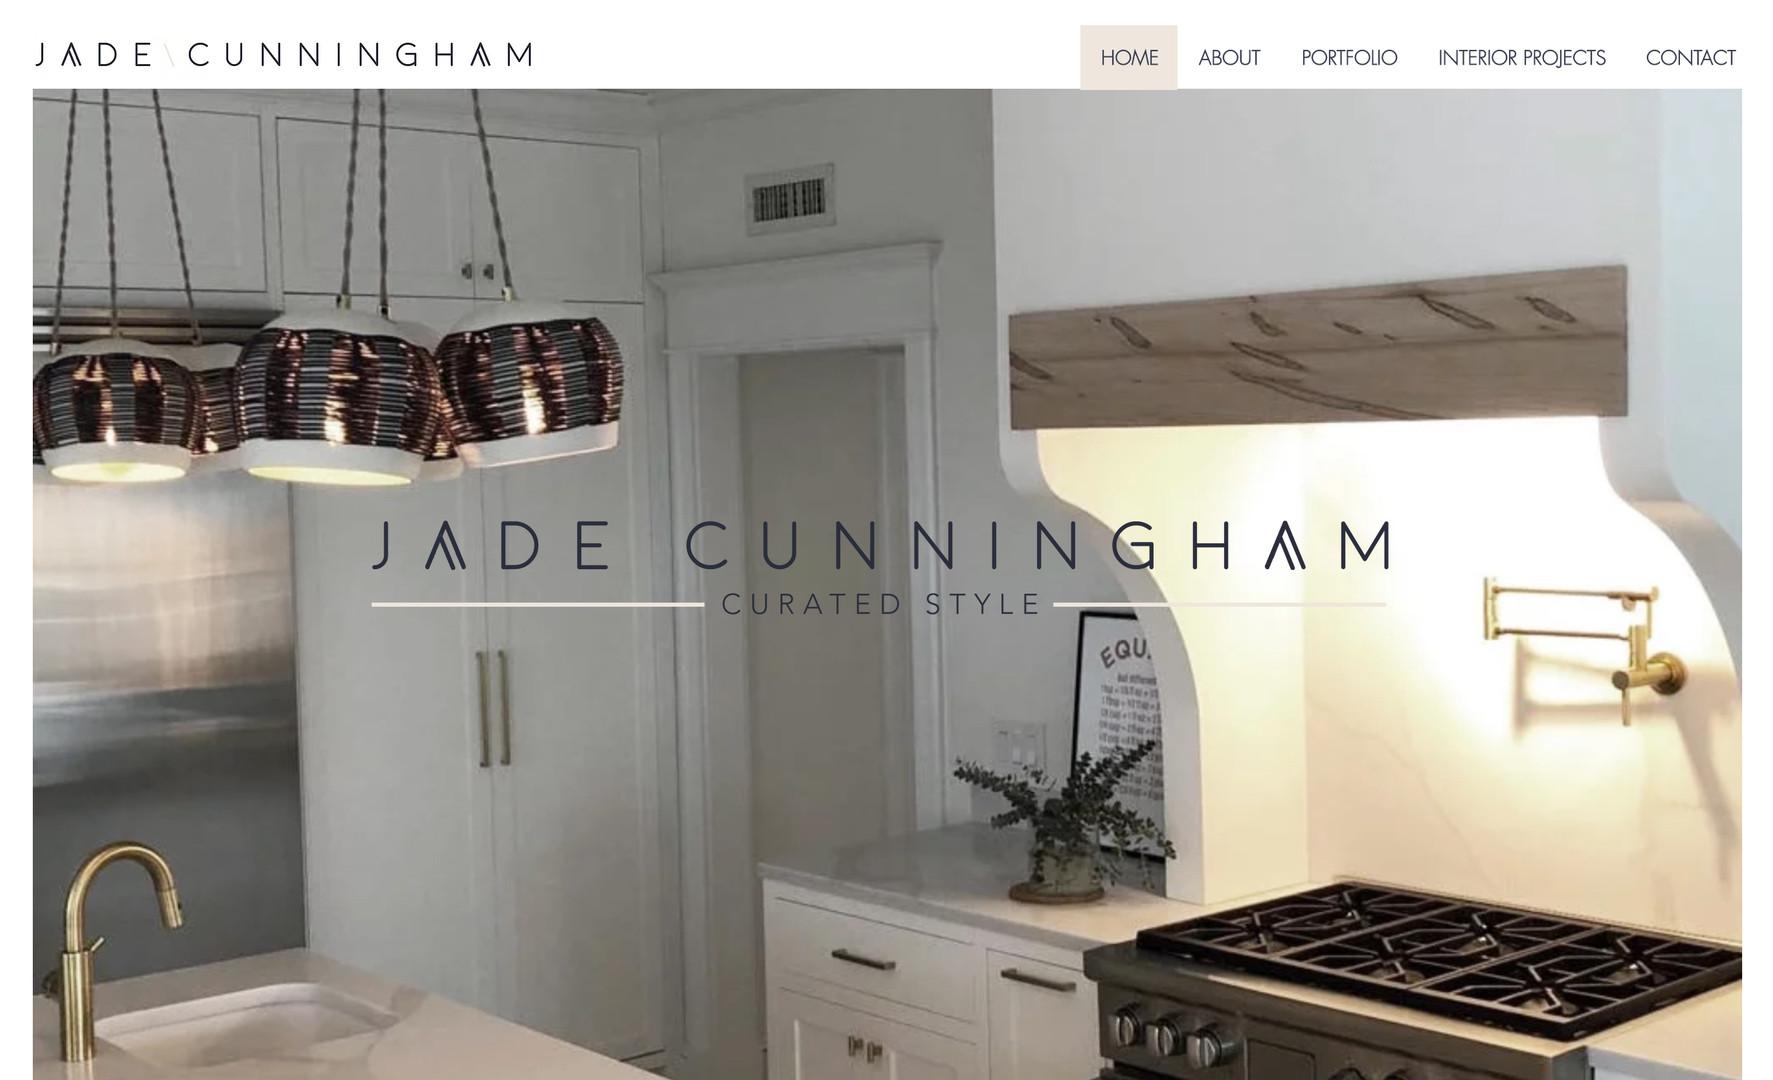 jade cunningham.jpg